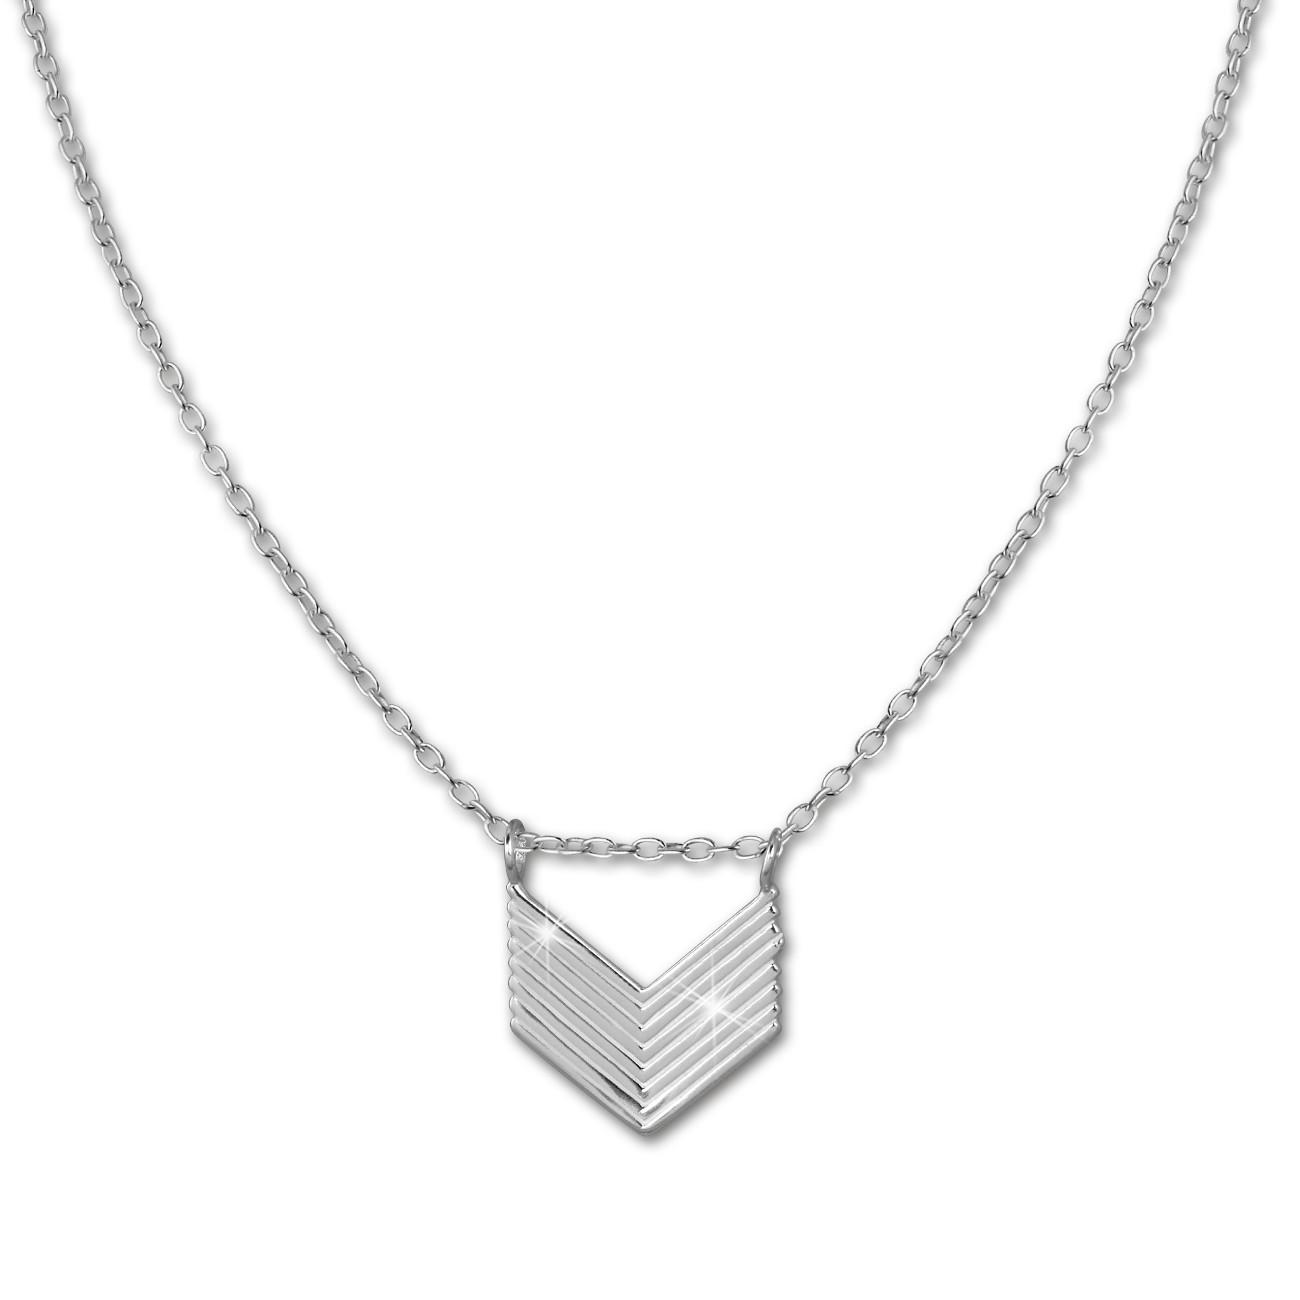 SilberDream Kette Pfeil 925er Sterling Silber 45cm Damen Halskette SDK8012J